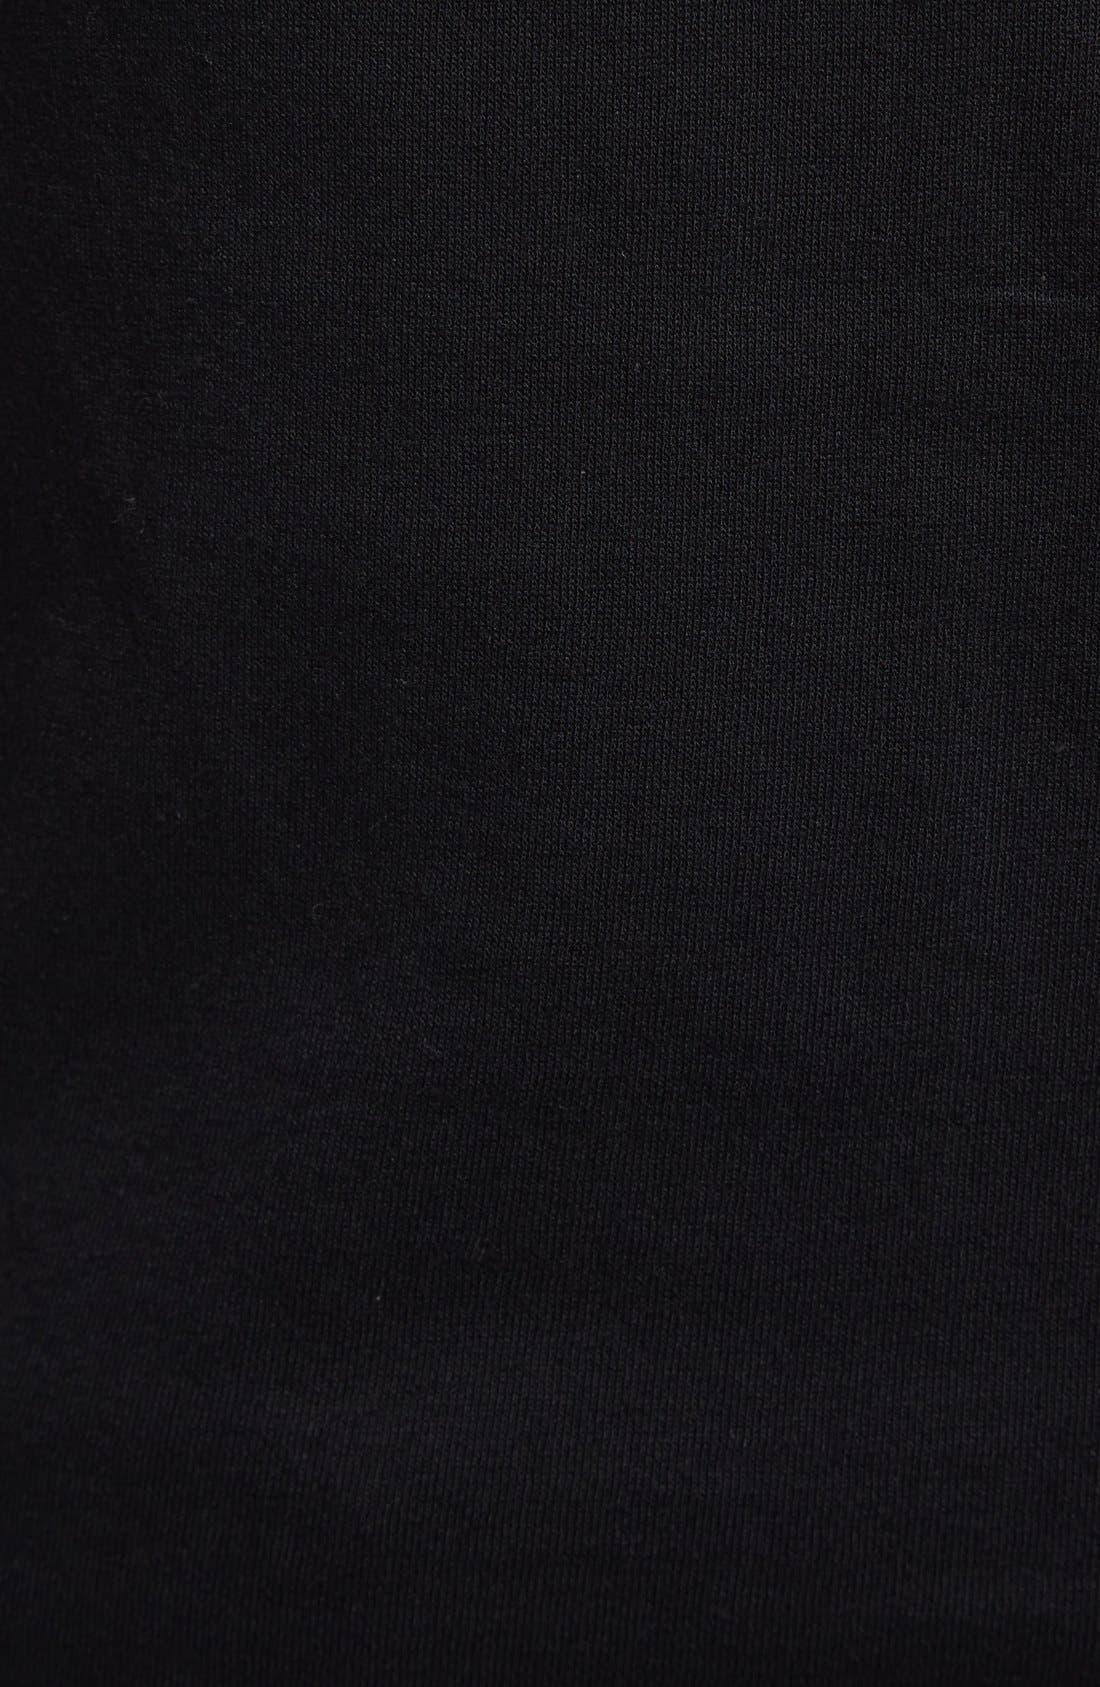 Alternate Image 3  - Obey 'Spirit of the Street' Short Sleeve Henley T-Shirt